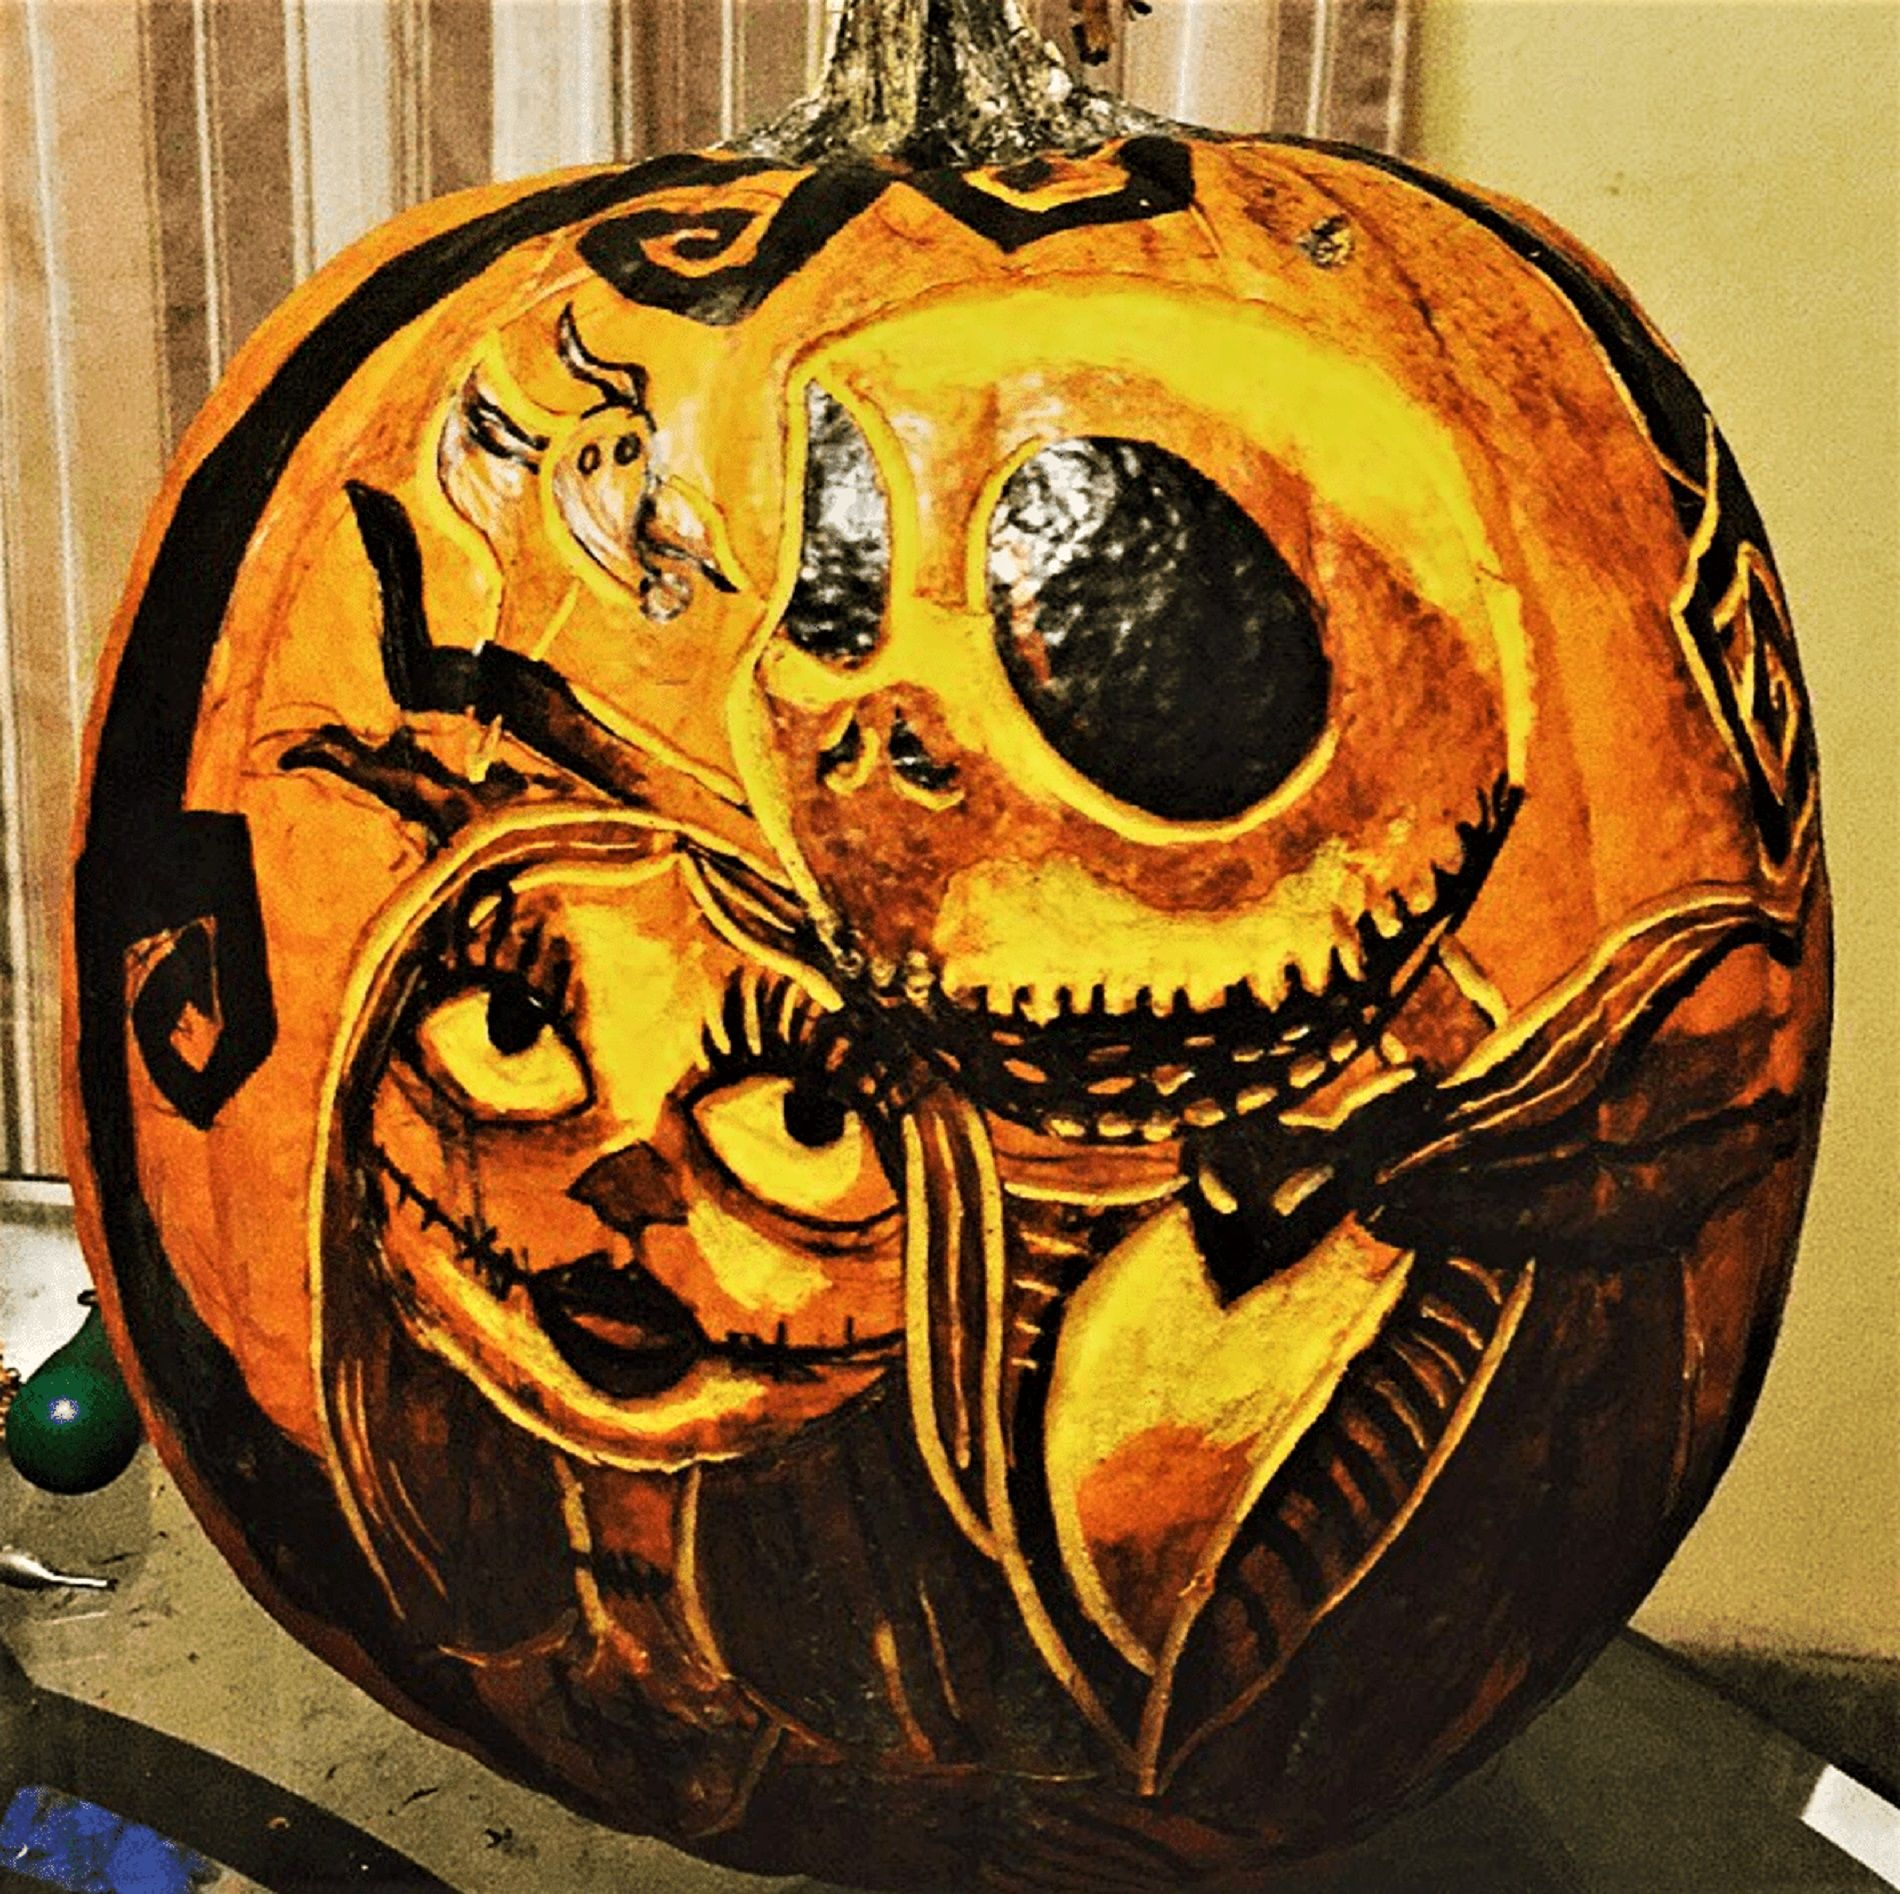 Jack Skellington Pumpkin Carving Creative pumpkin